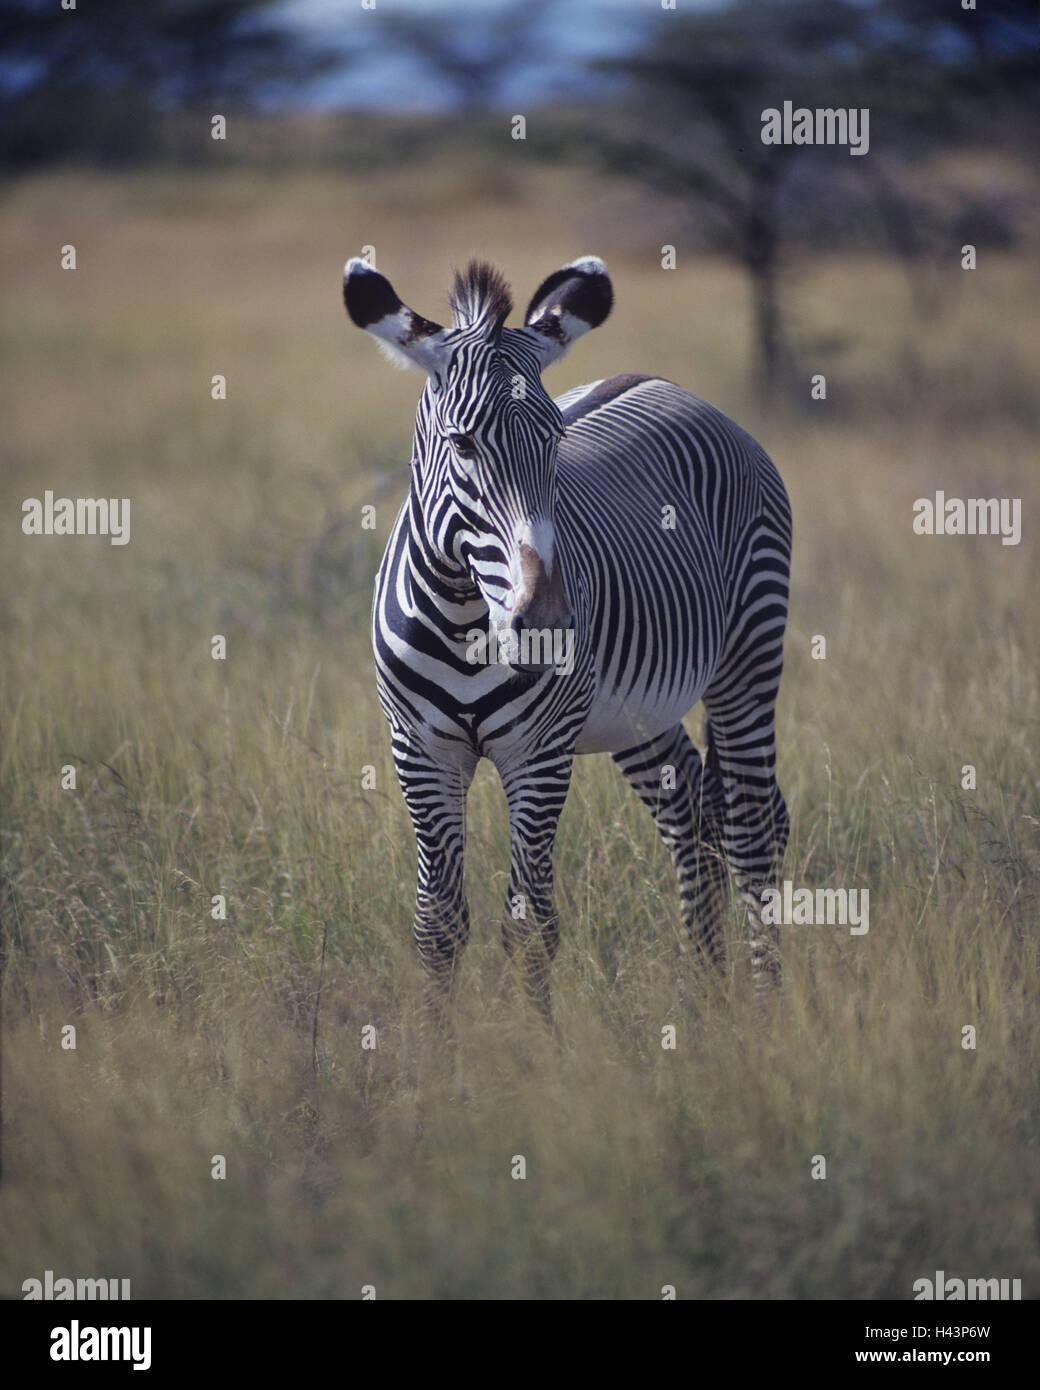 Steppe, Grevyzebra, Equus grevyi, watchfulness, Africa, Kenya, animal world, wilderness, Wildlife, animal, mammal, Stock Photo